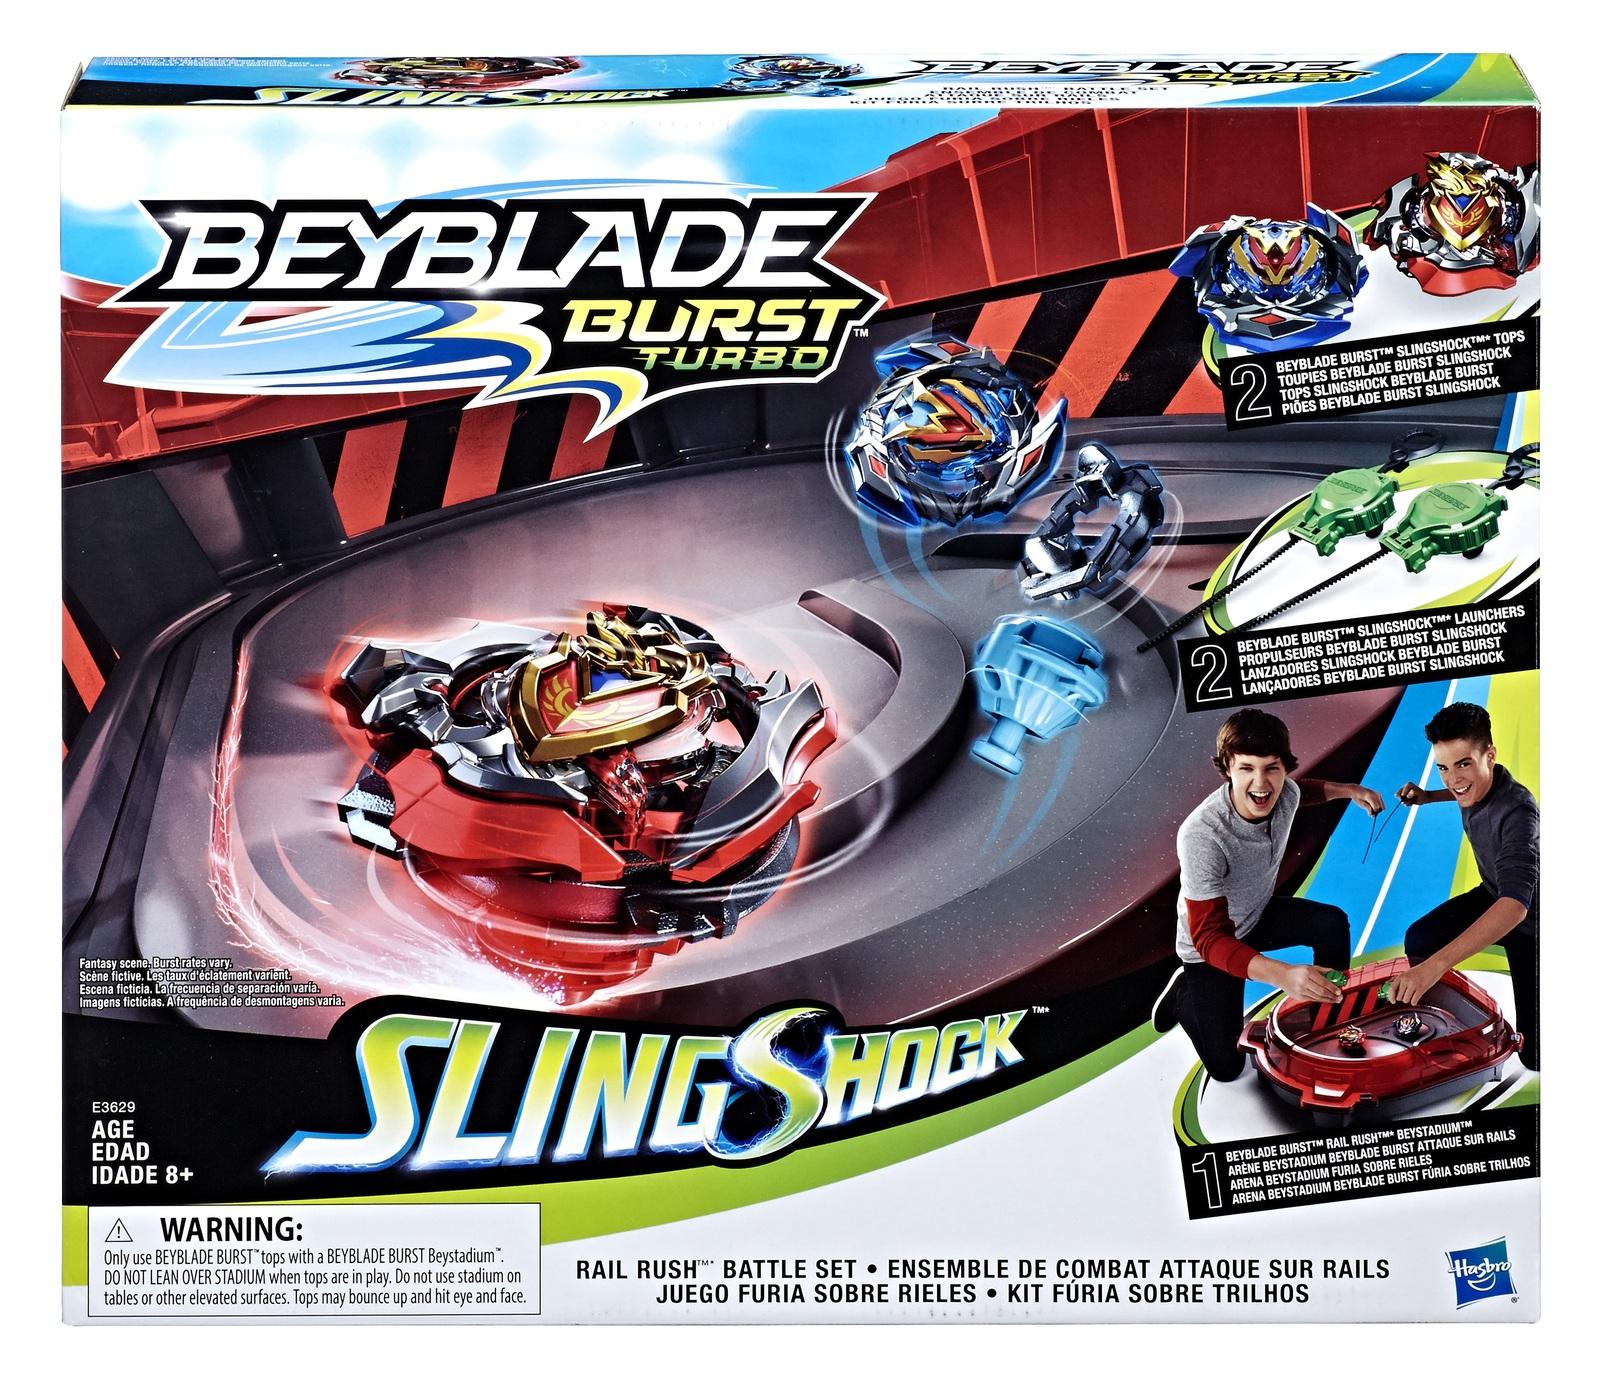 Beyblade Burst: Slingshock - Rail Rush Battle Set image